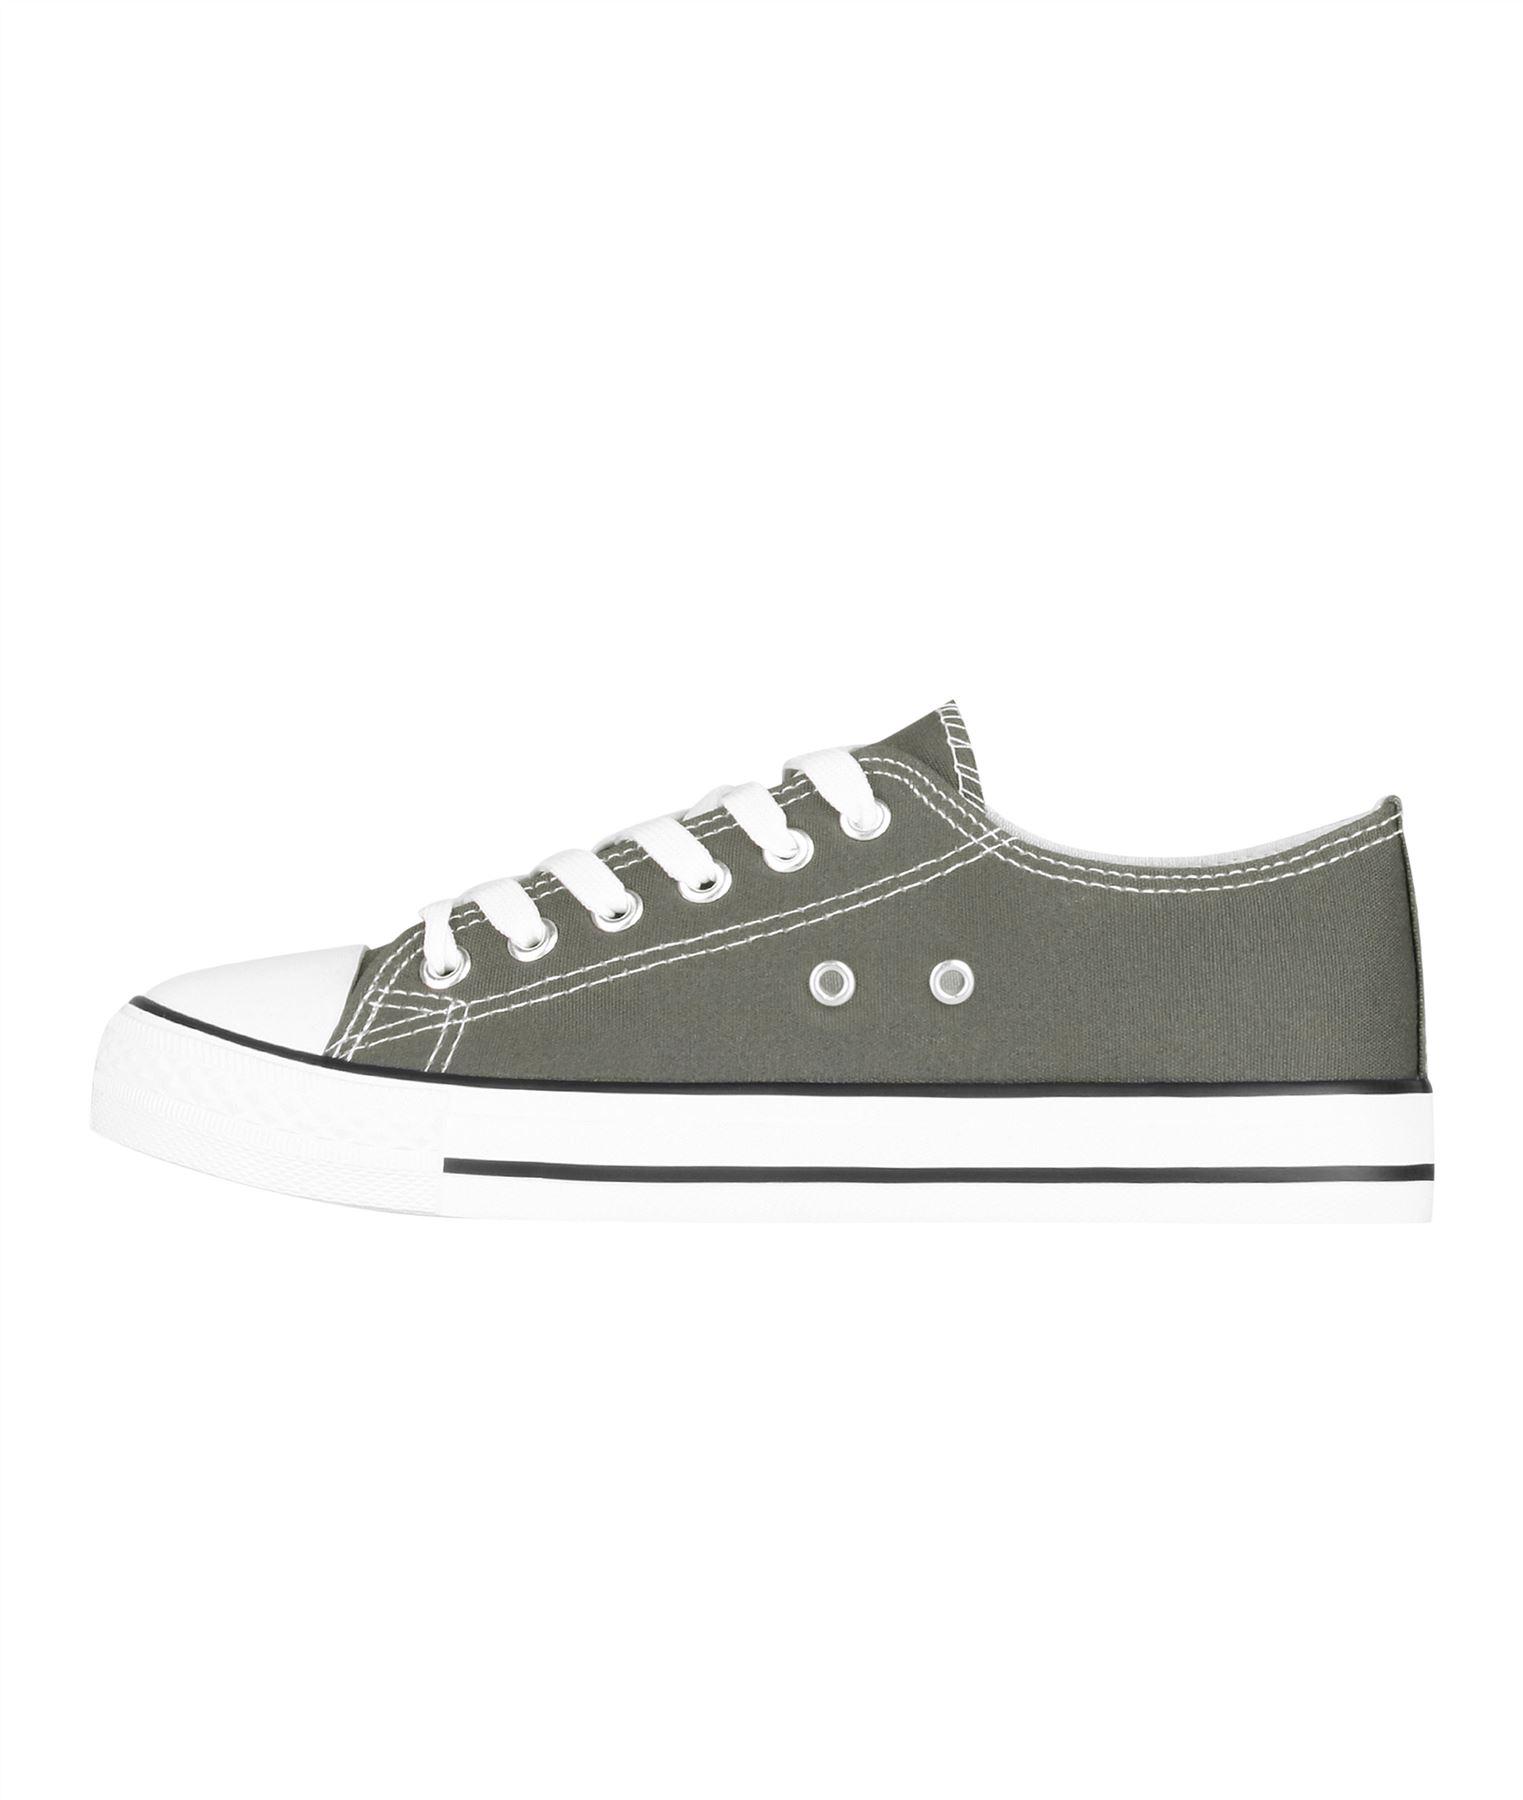 Zapatillas-Mujer-Casuales-Deportiva-Barata-Lona-Moda-Originales-Outlet-Tela-Moda miniatura 21